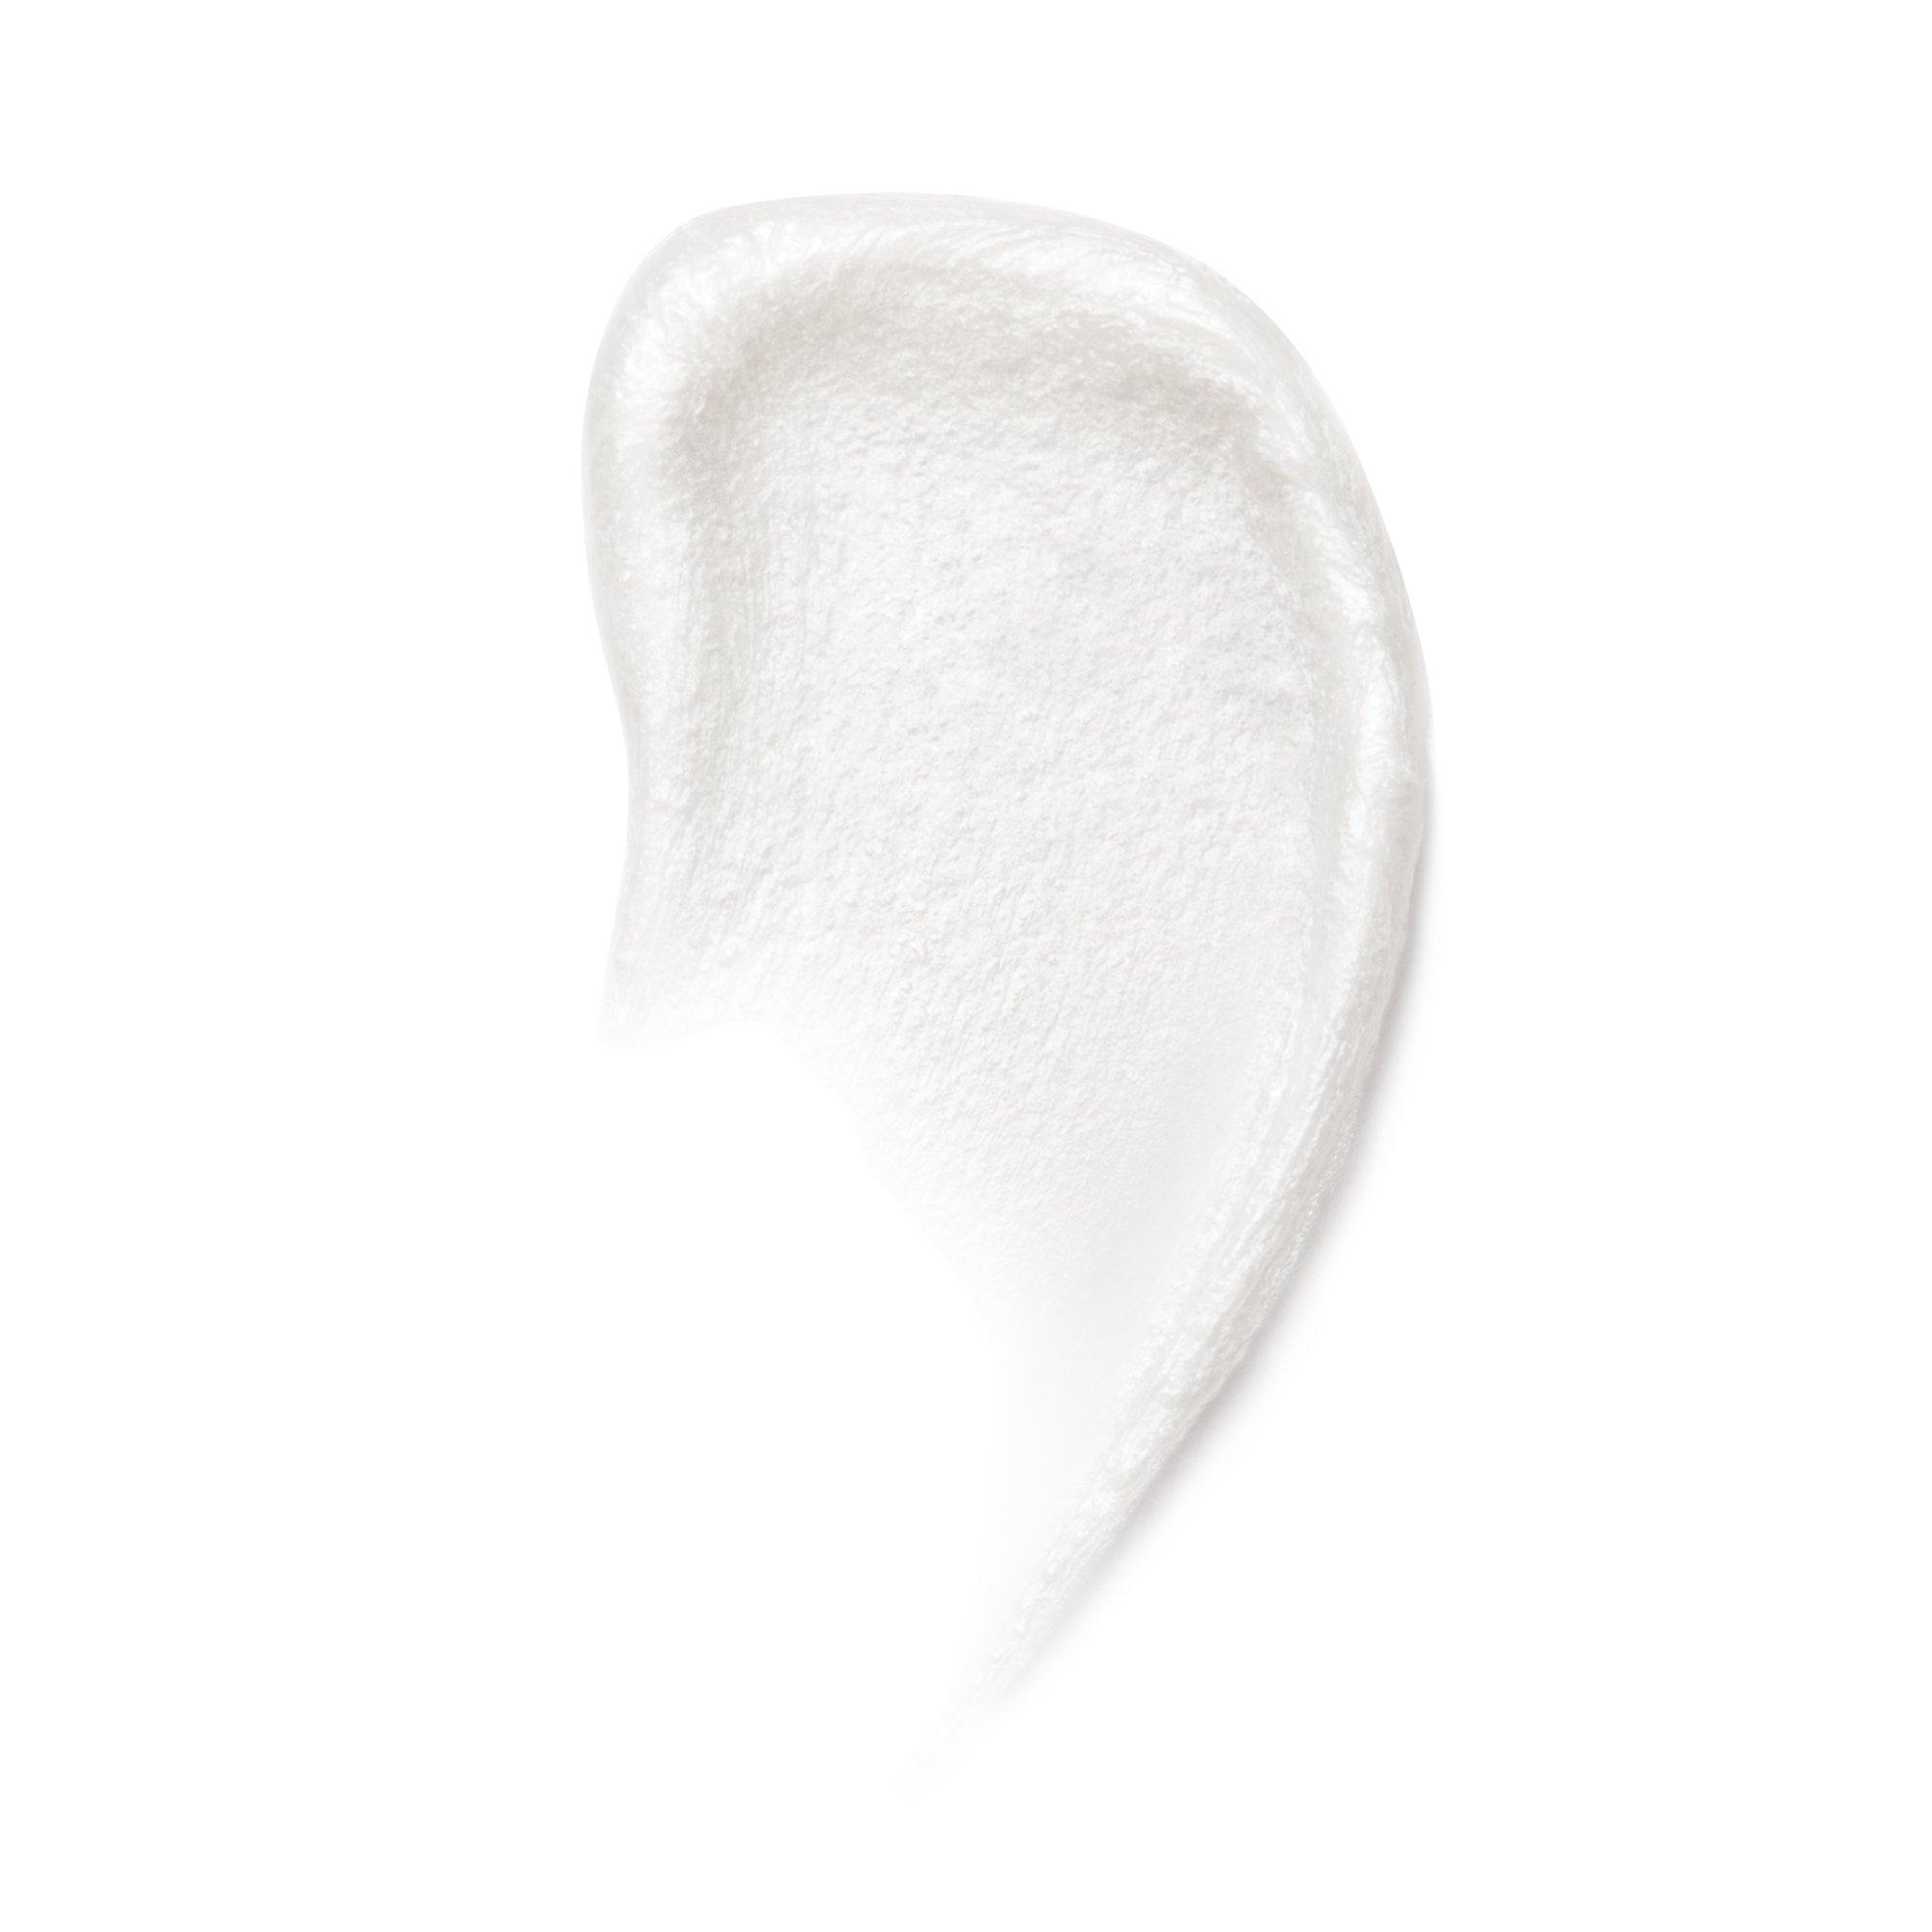 Murad Resurgence Renewing Cleansing Cream, 1: Cleanse/Tone, 6.75 fl oz (200 ml) by Murad